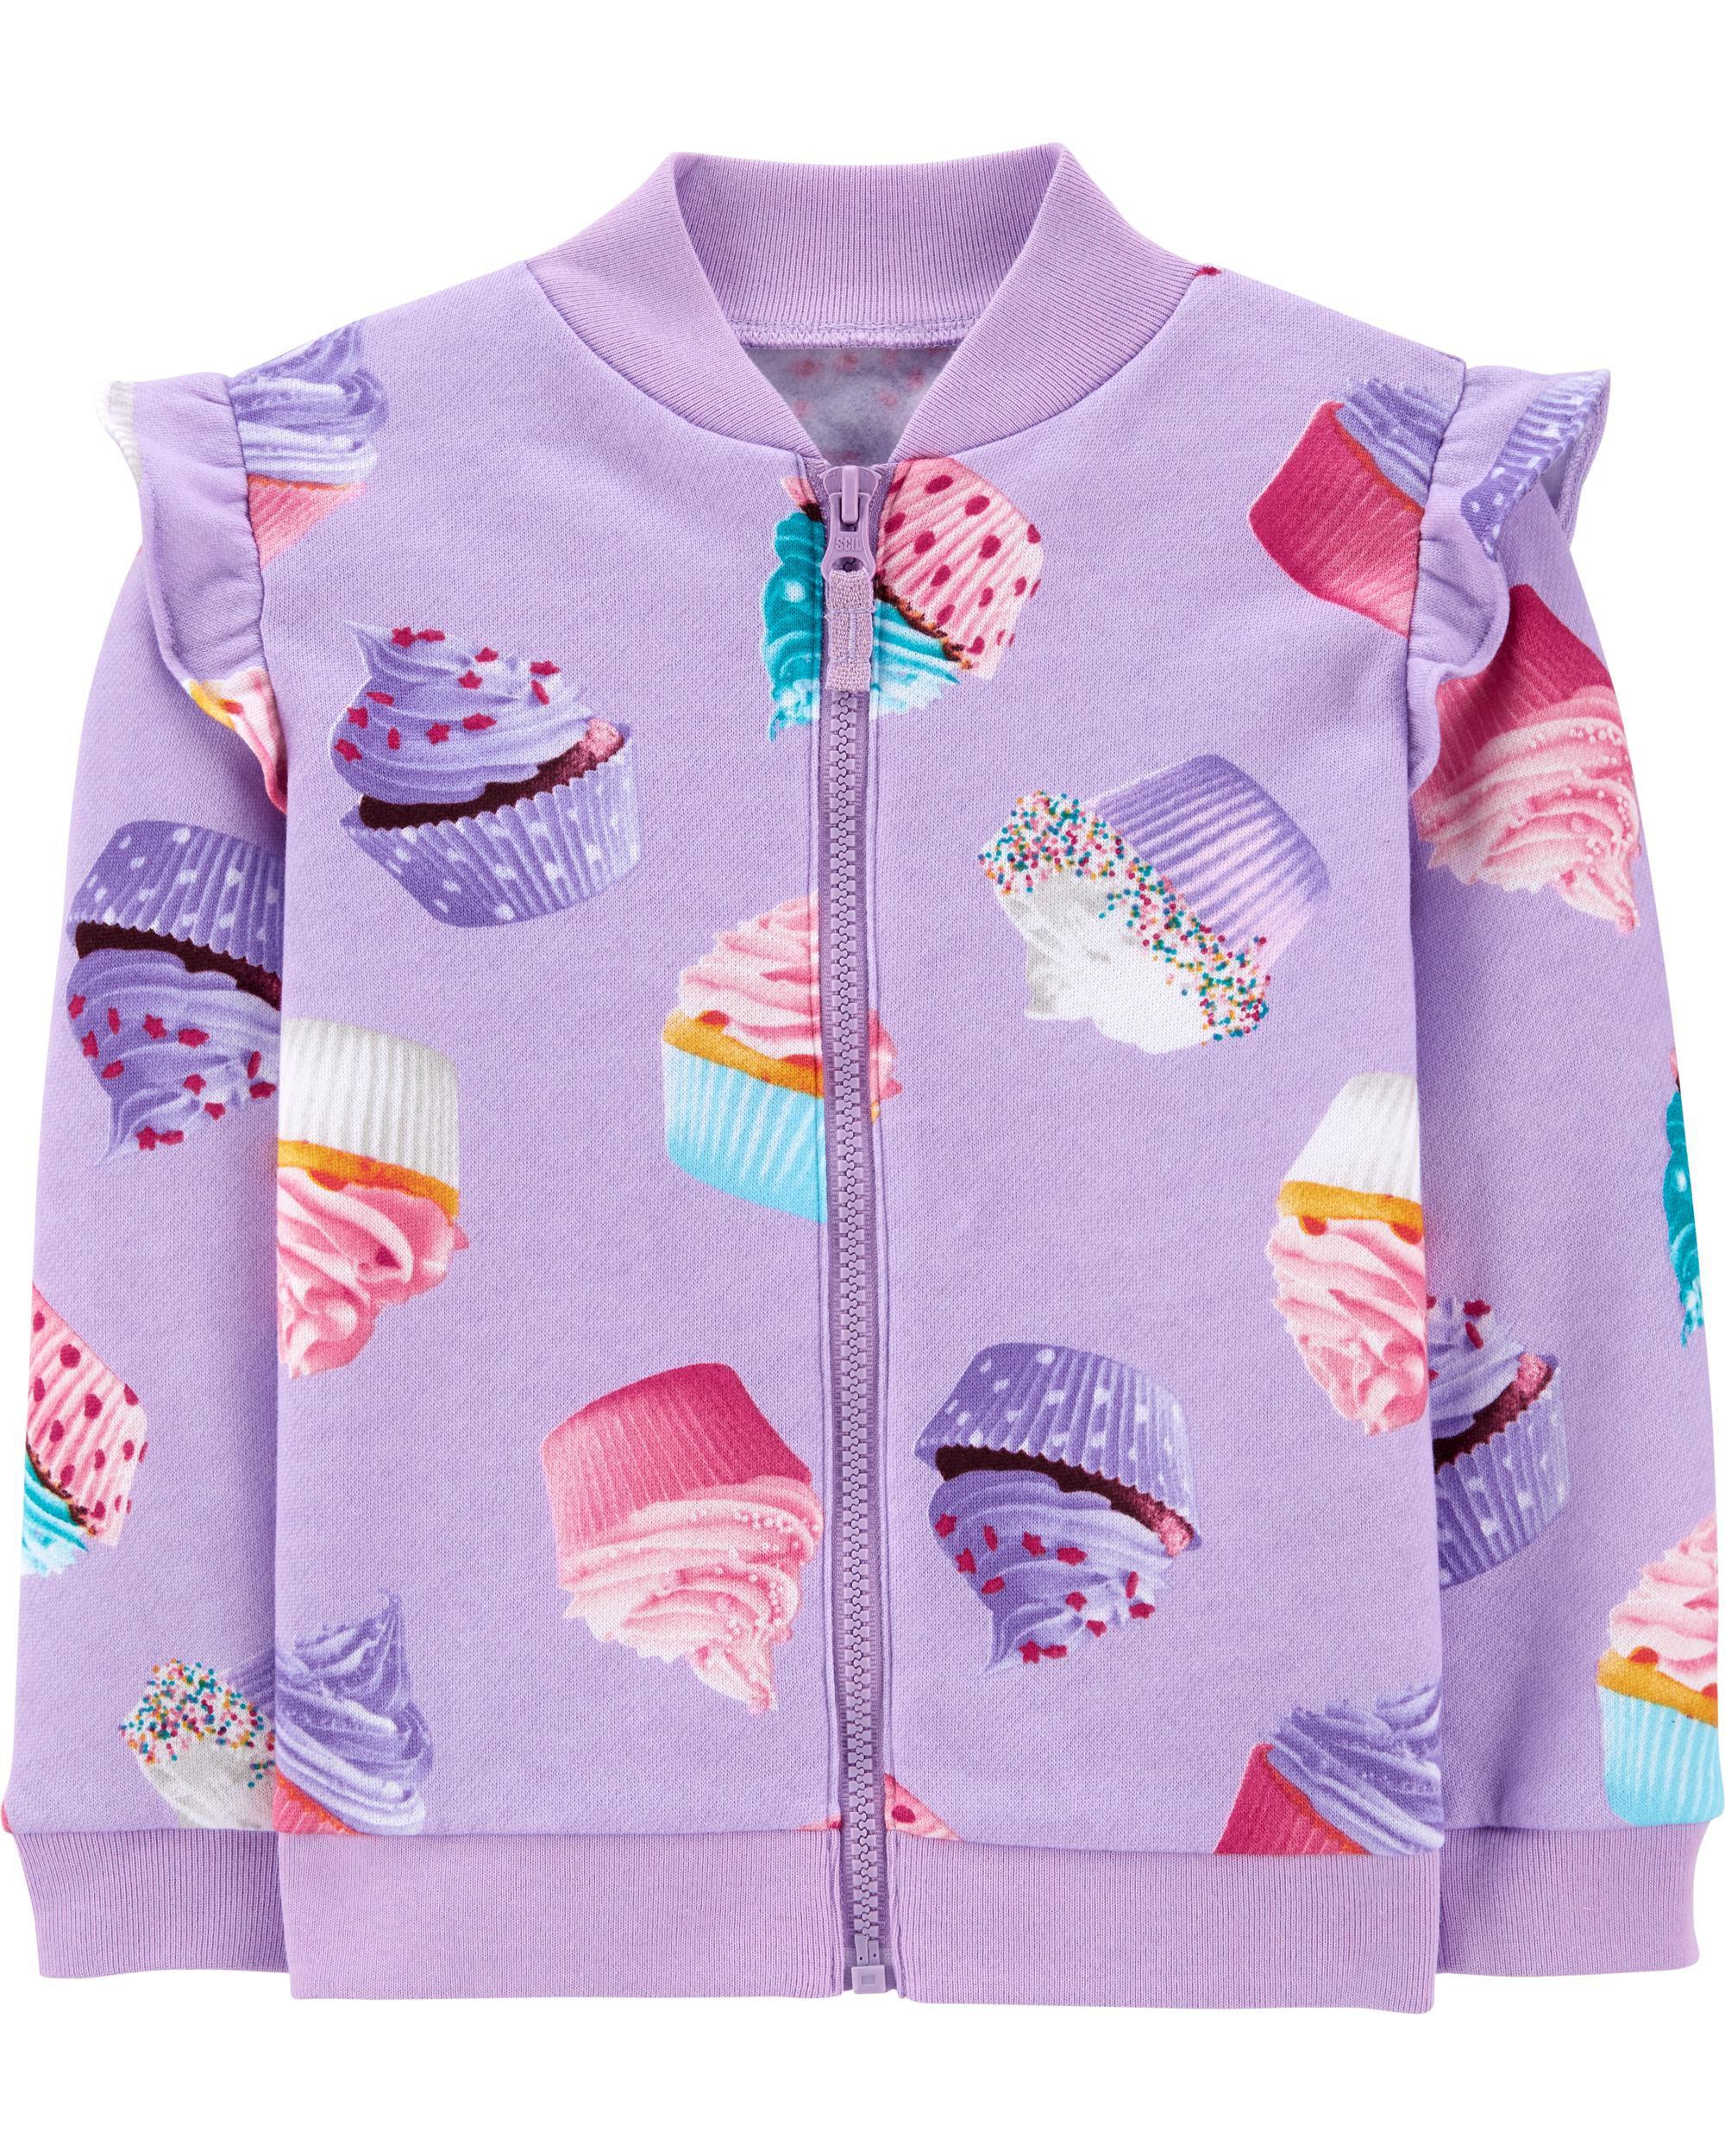 *CLEARANCE* Cupcake Zip-Up Fleece Jacket